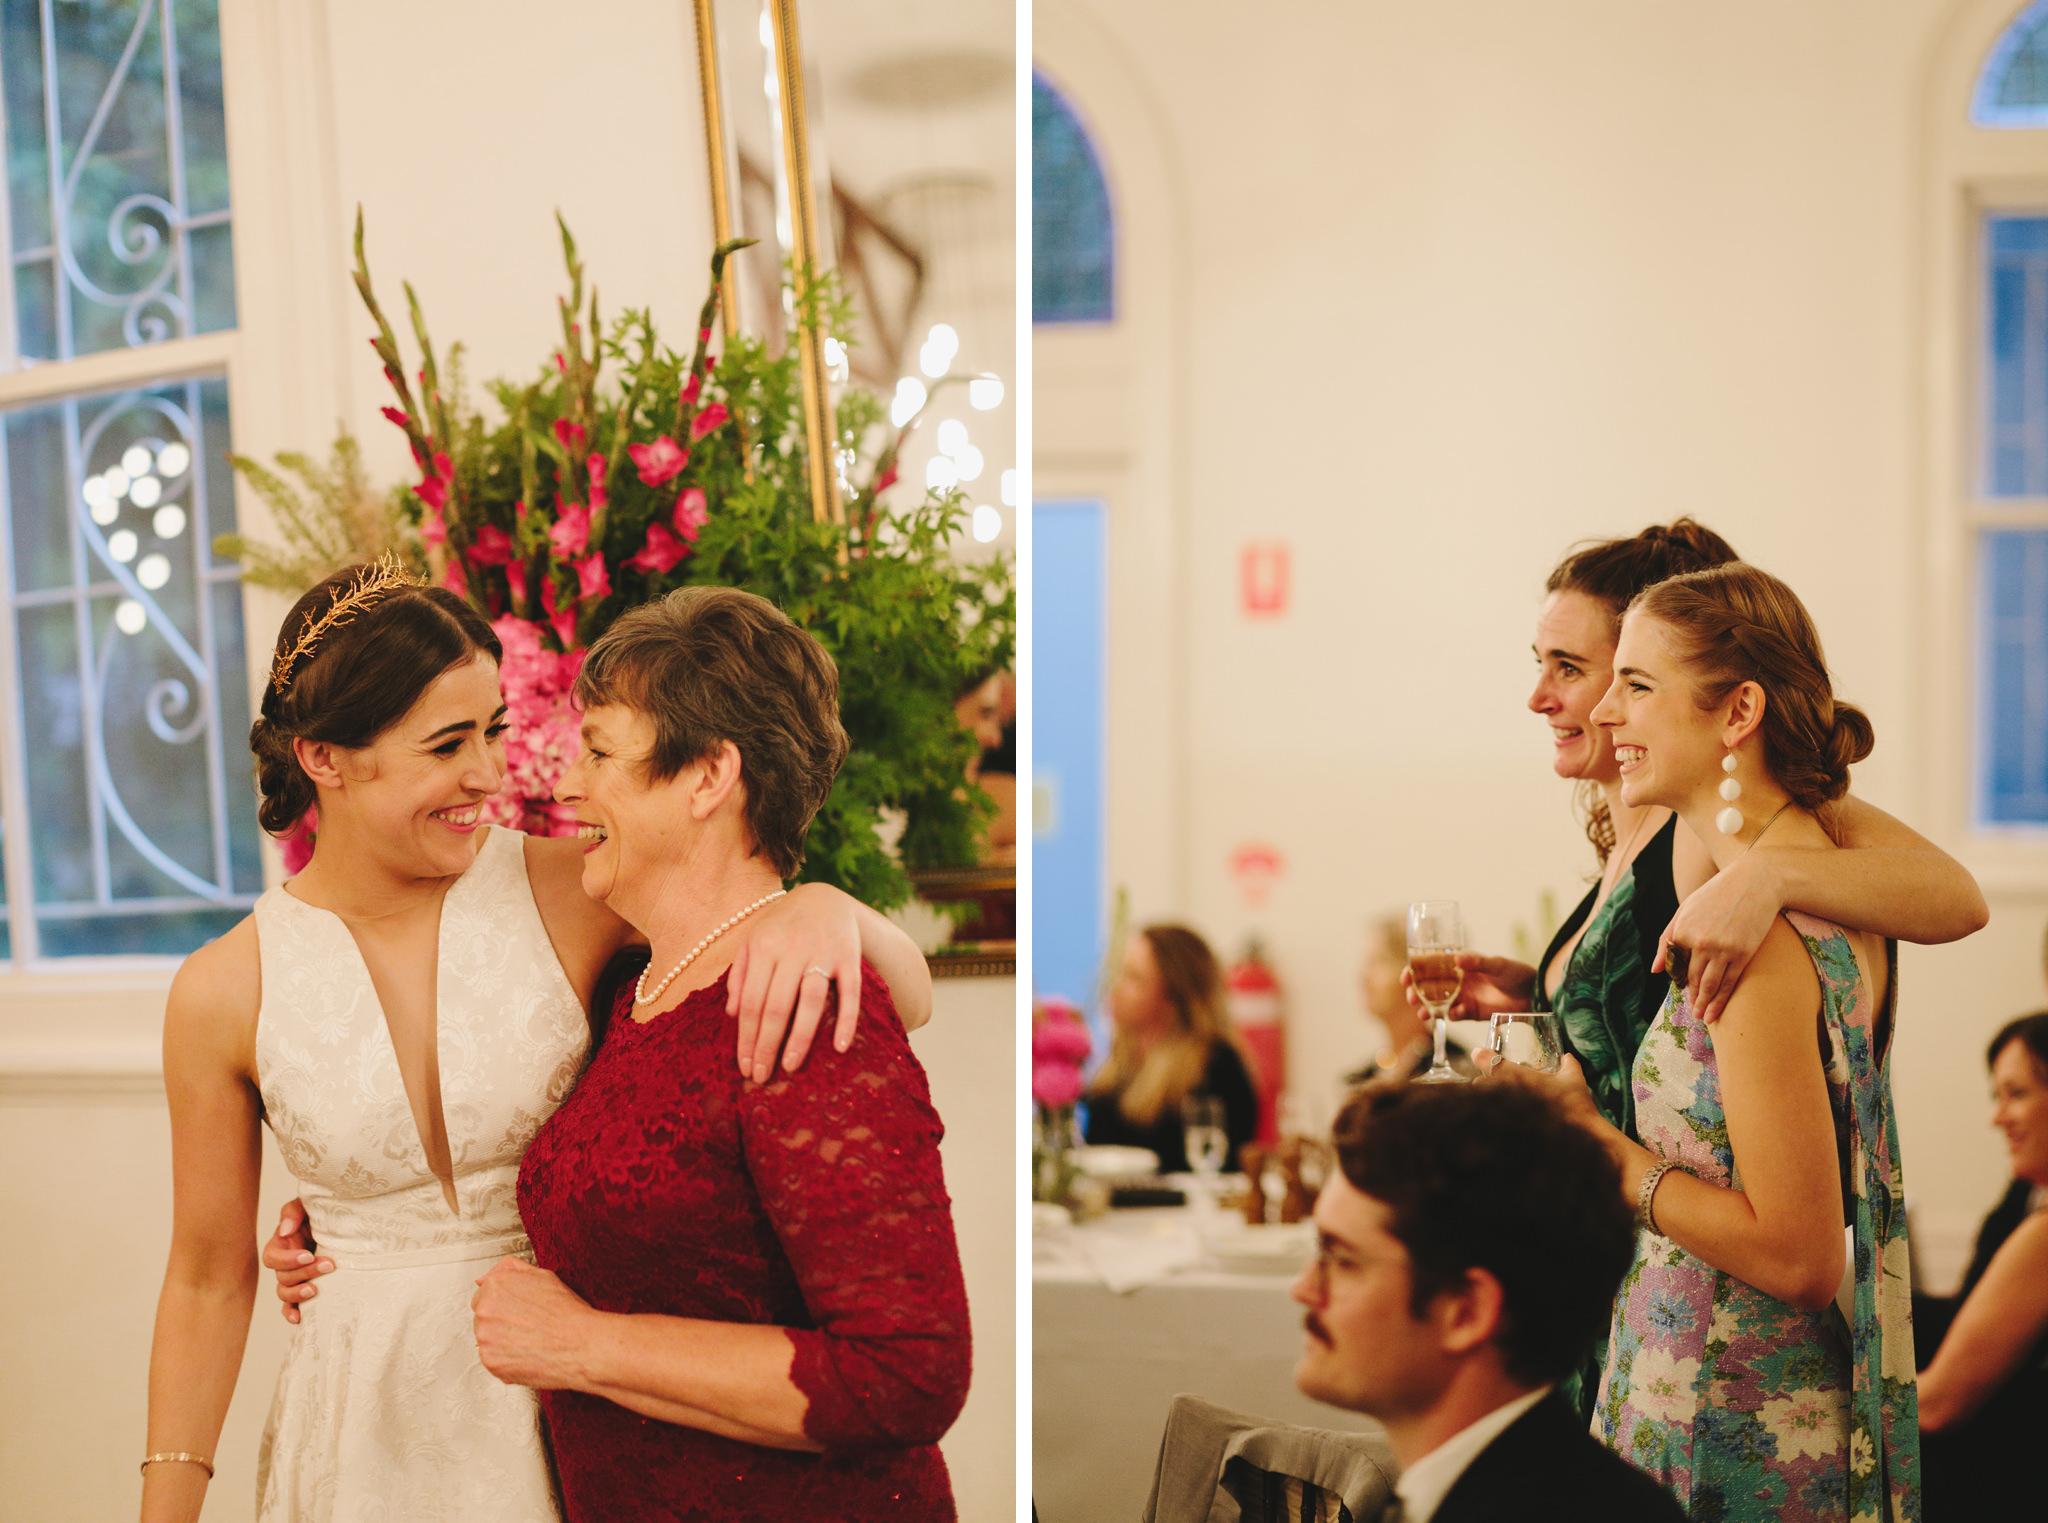 Abbotsford_Convent_Wedding_Peter_Anna109.JPG